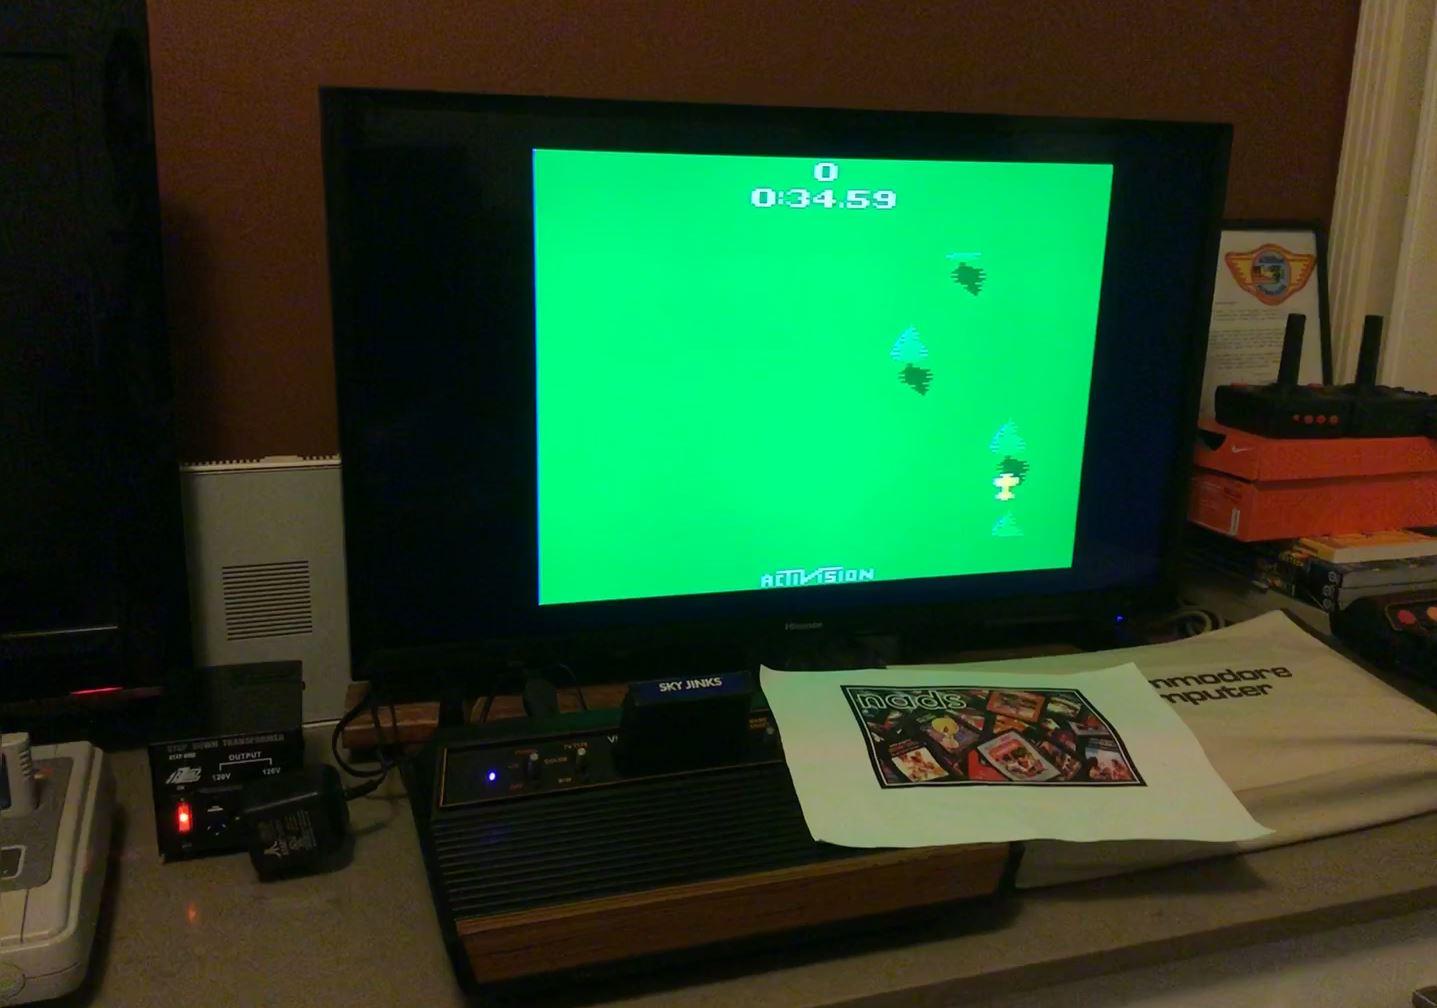 nads: Sky Jinks (Atari 2600 Novice/B) 0:00:34.59 points on 2018-10-29 15:23:27